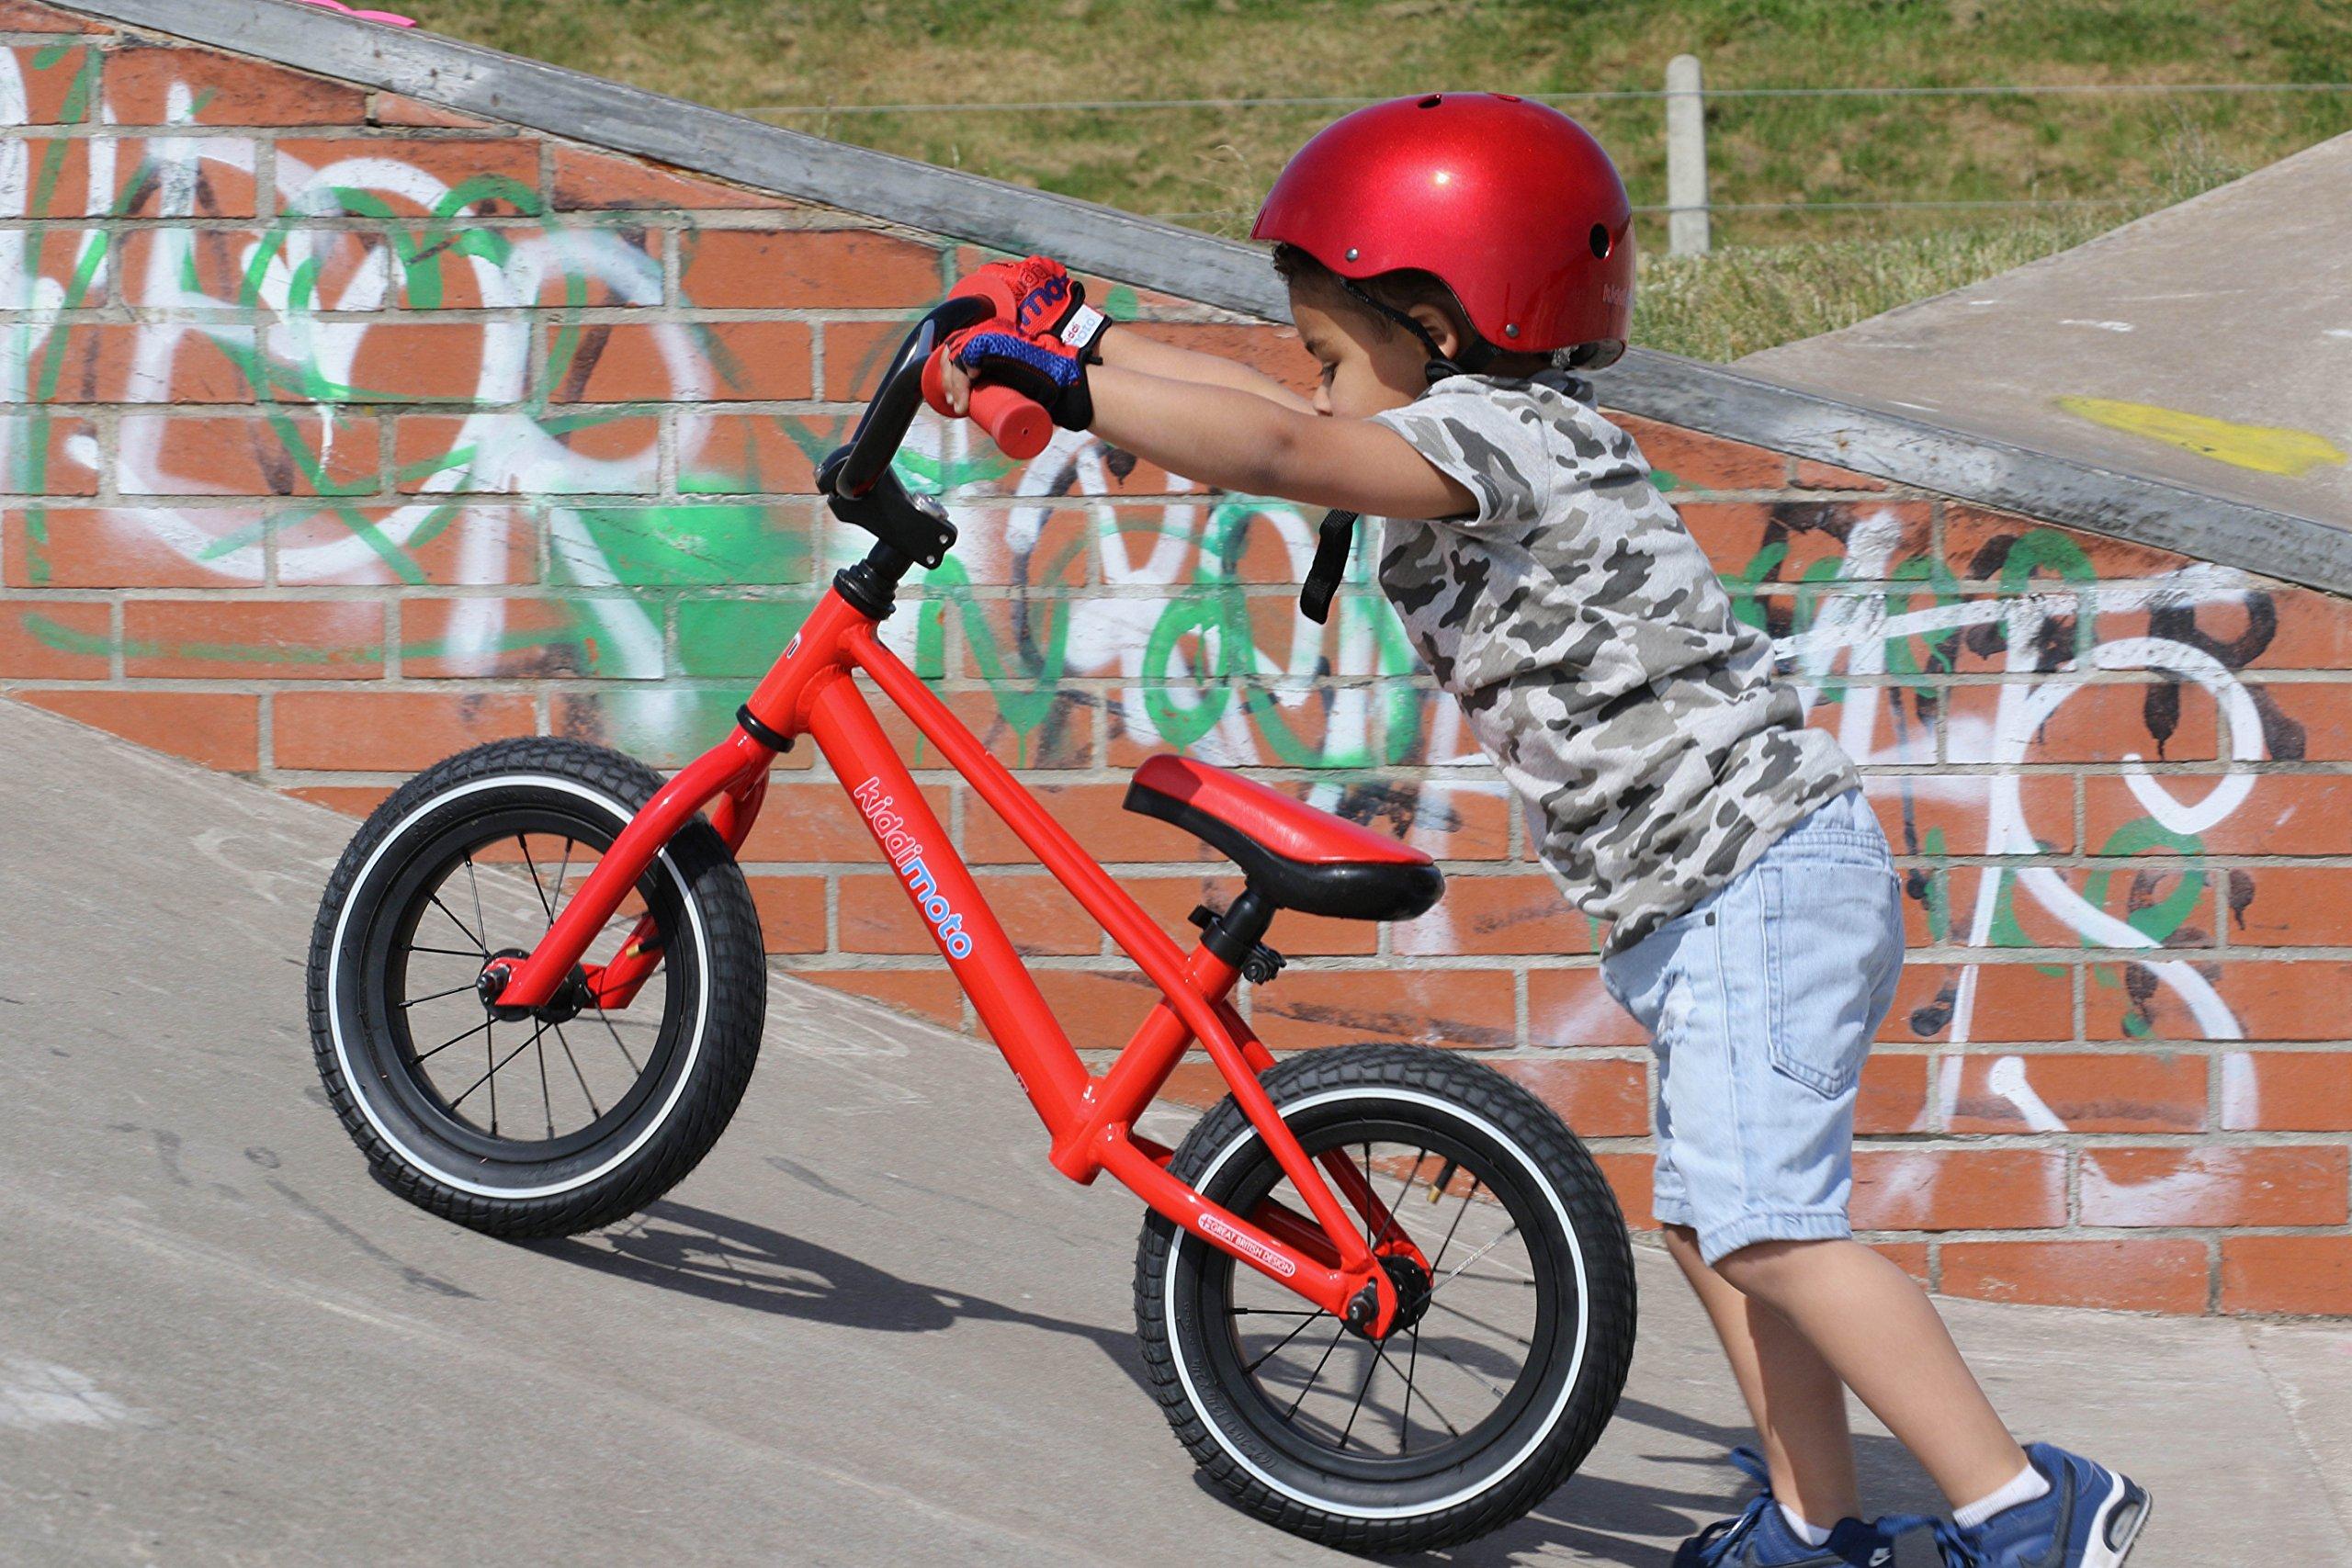 Kiddimoto BMX Running/Balance Bike, Red by Kiddimoto (Image #5)